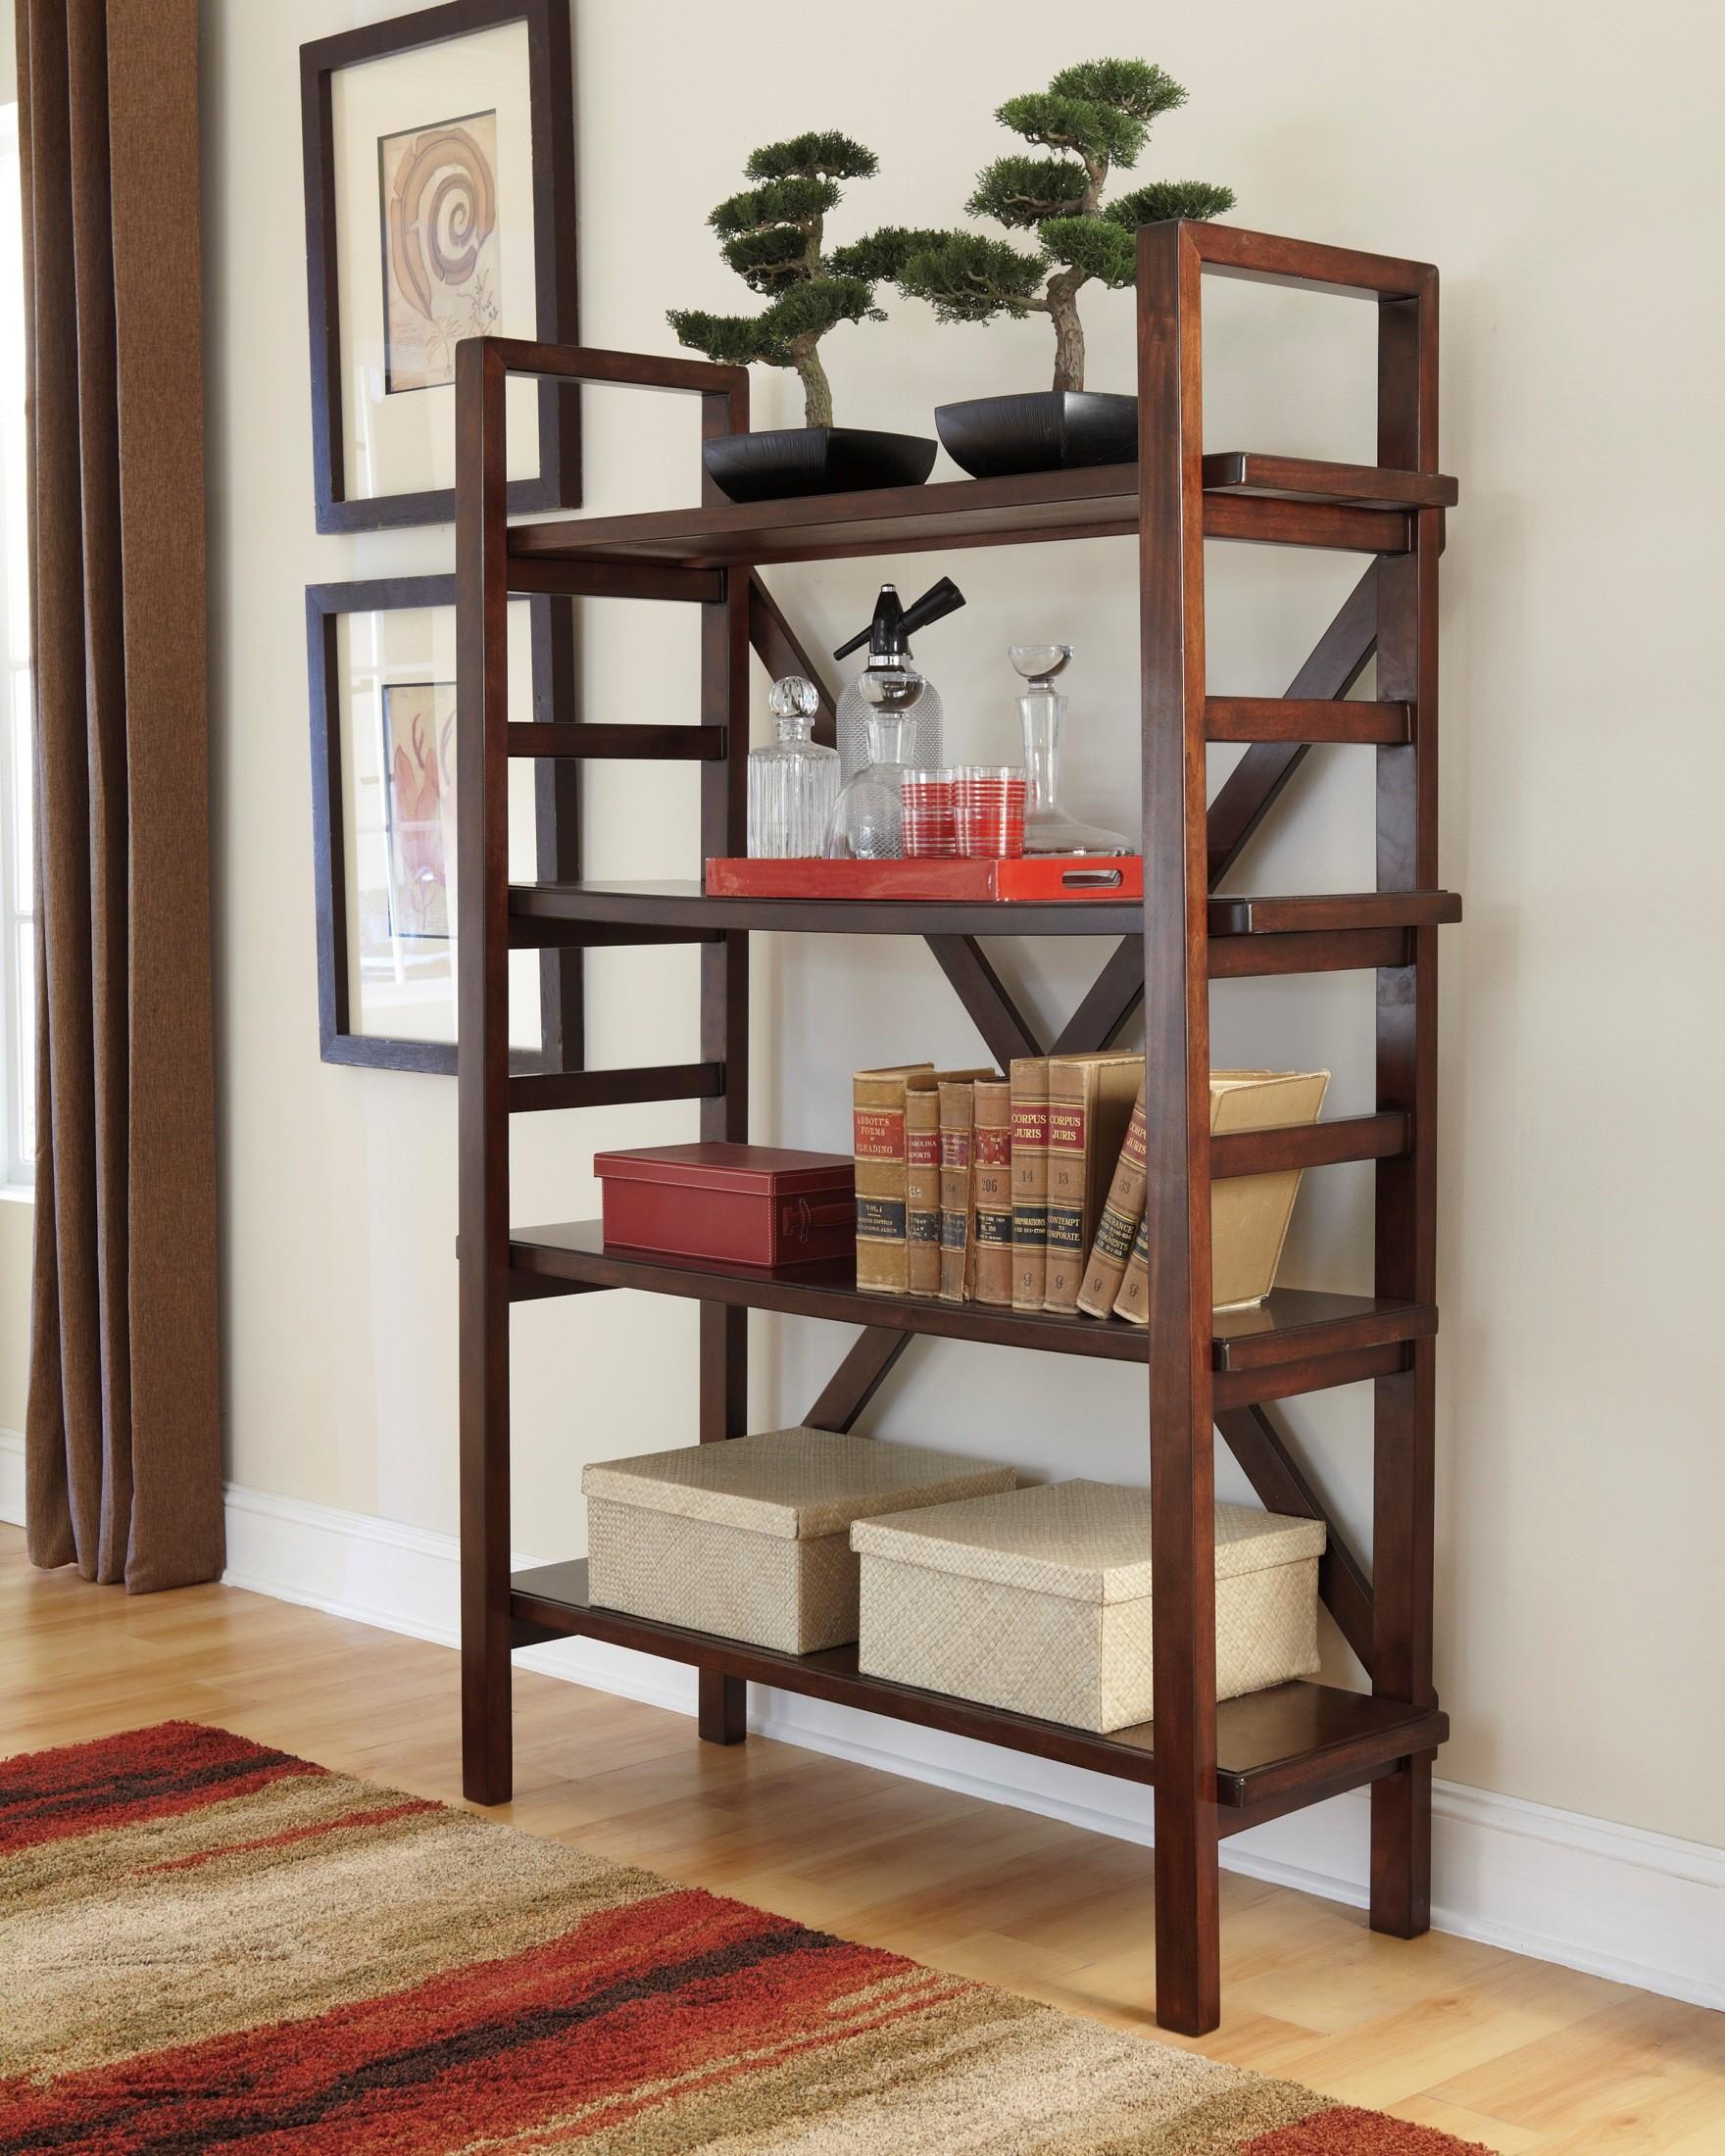 Hindell Park Bookcase, H695-17, Ashley Furniture